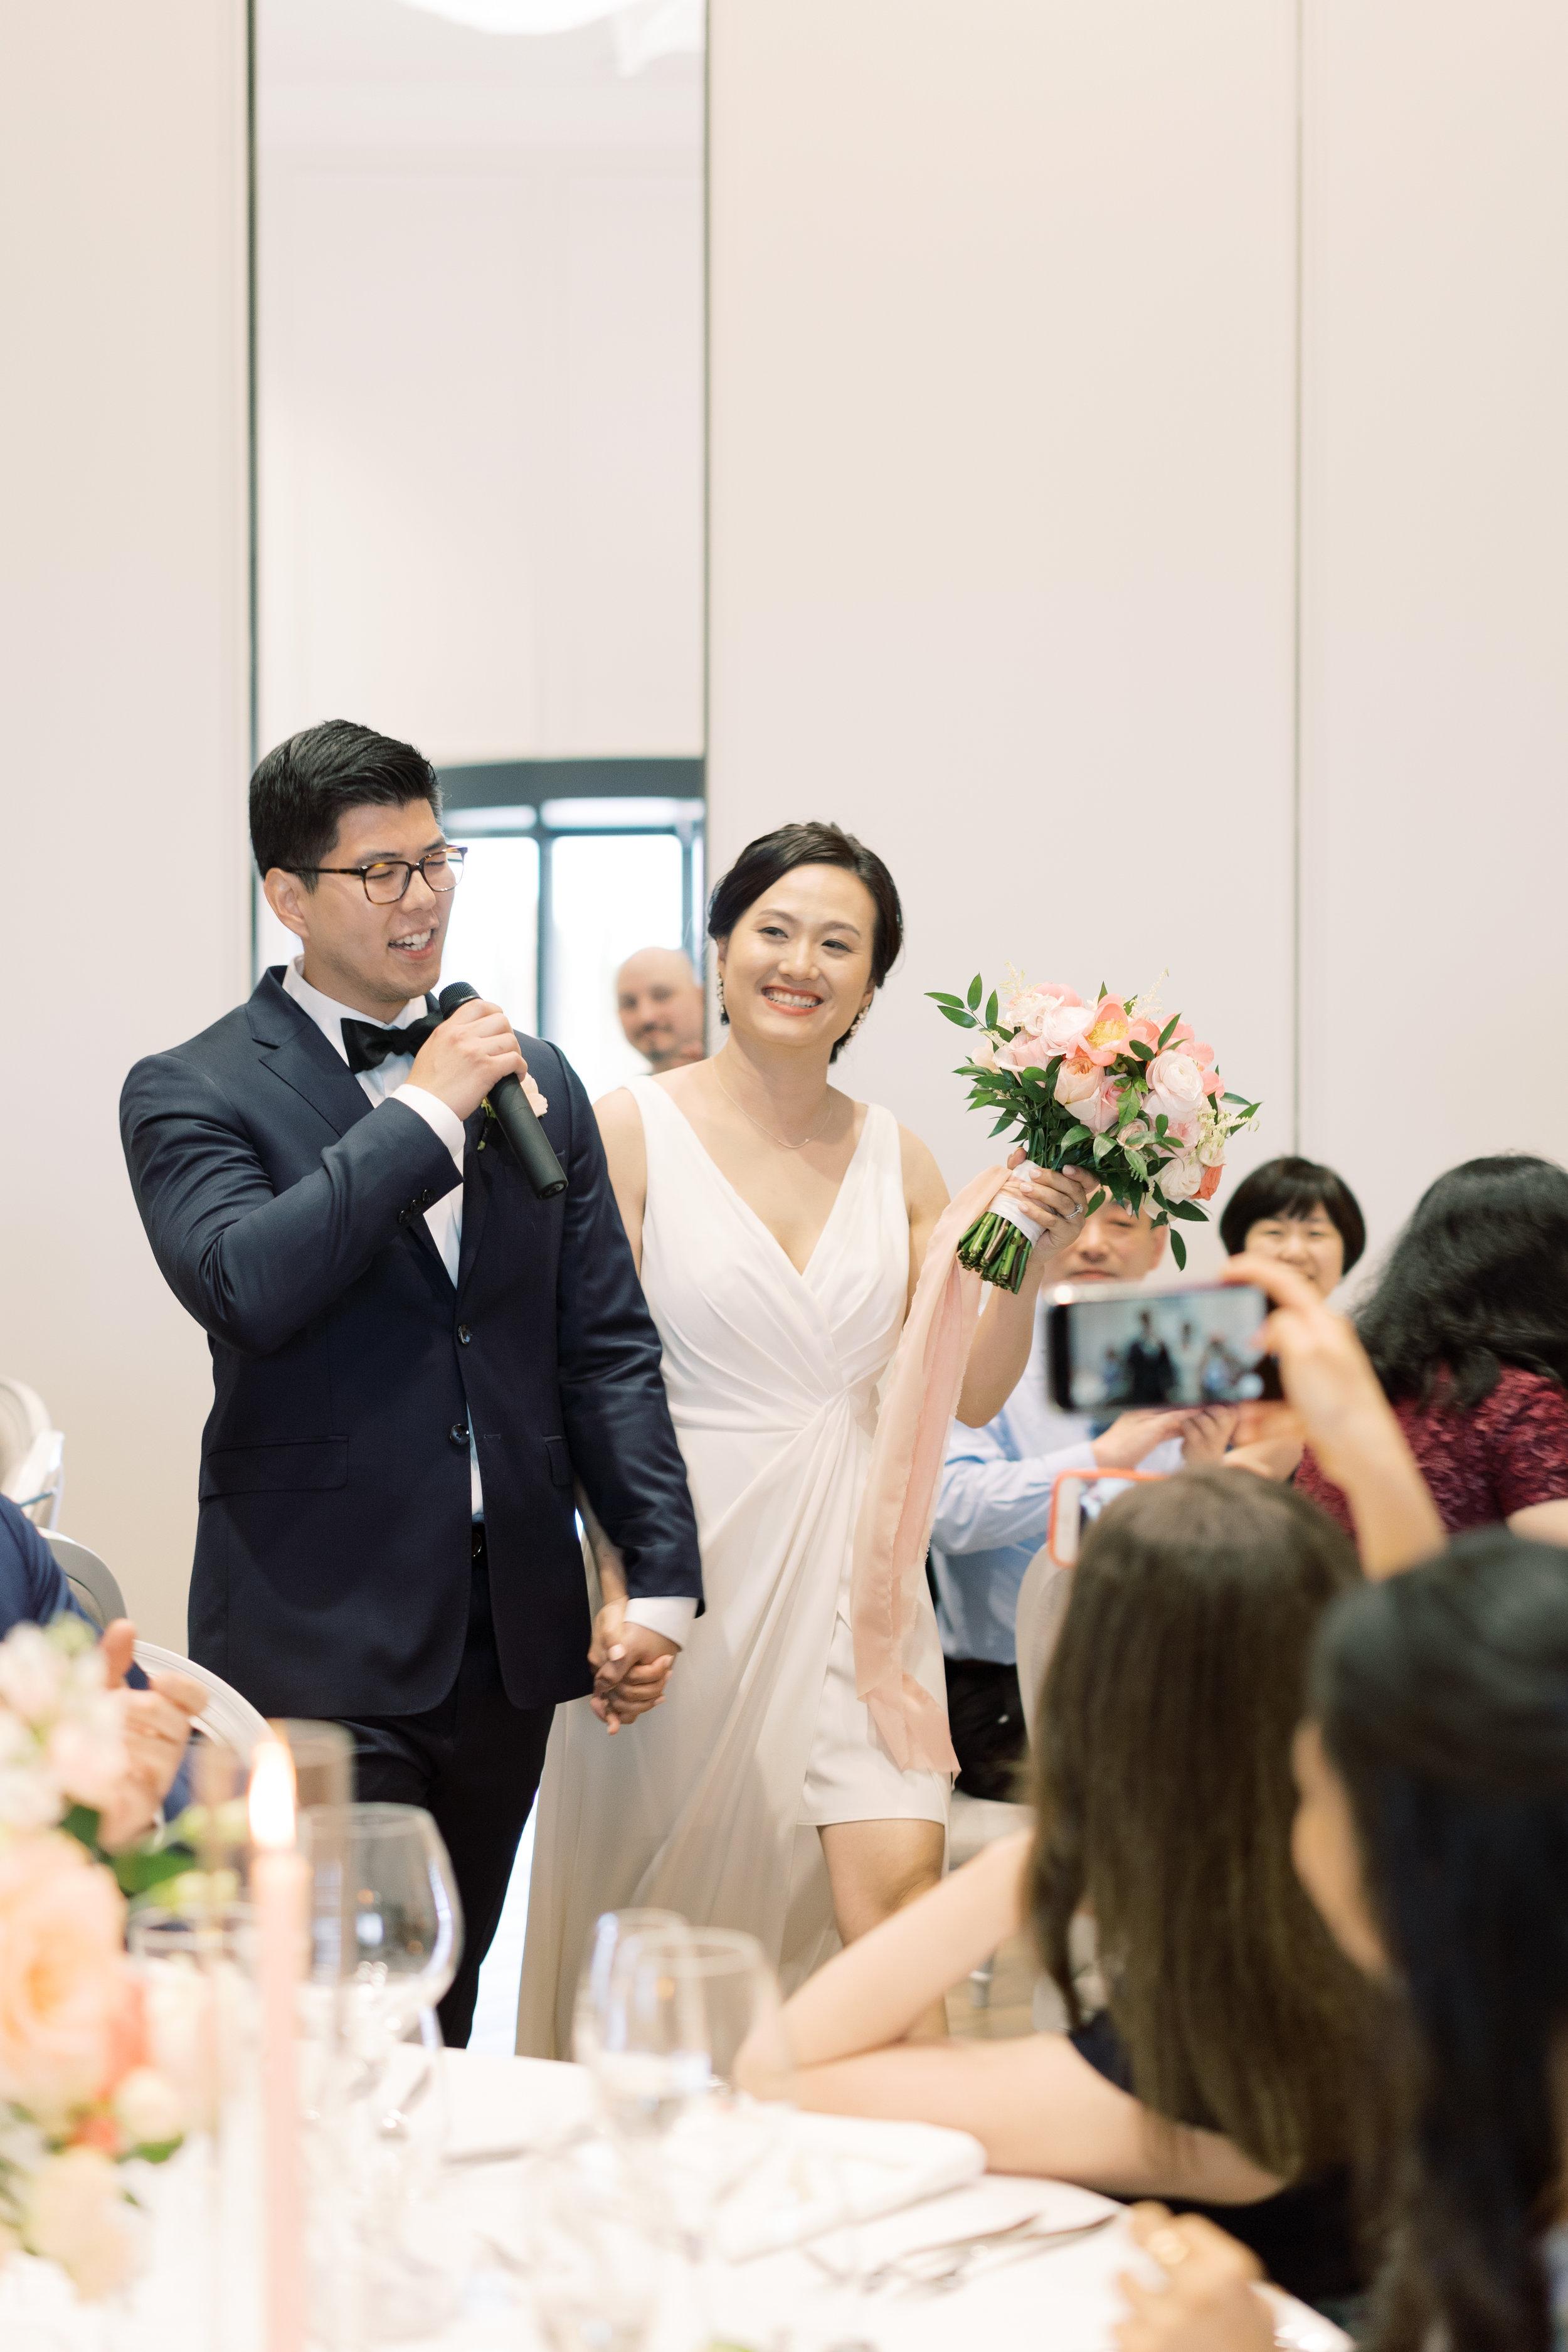 Arlington Estate Wedding - Reception-46.jpg